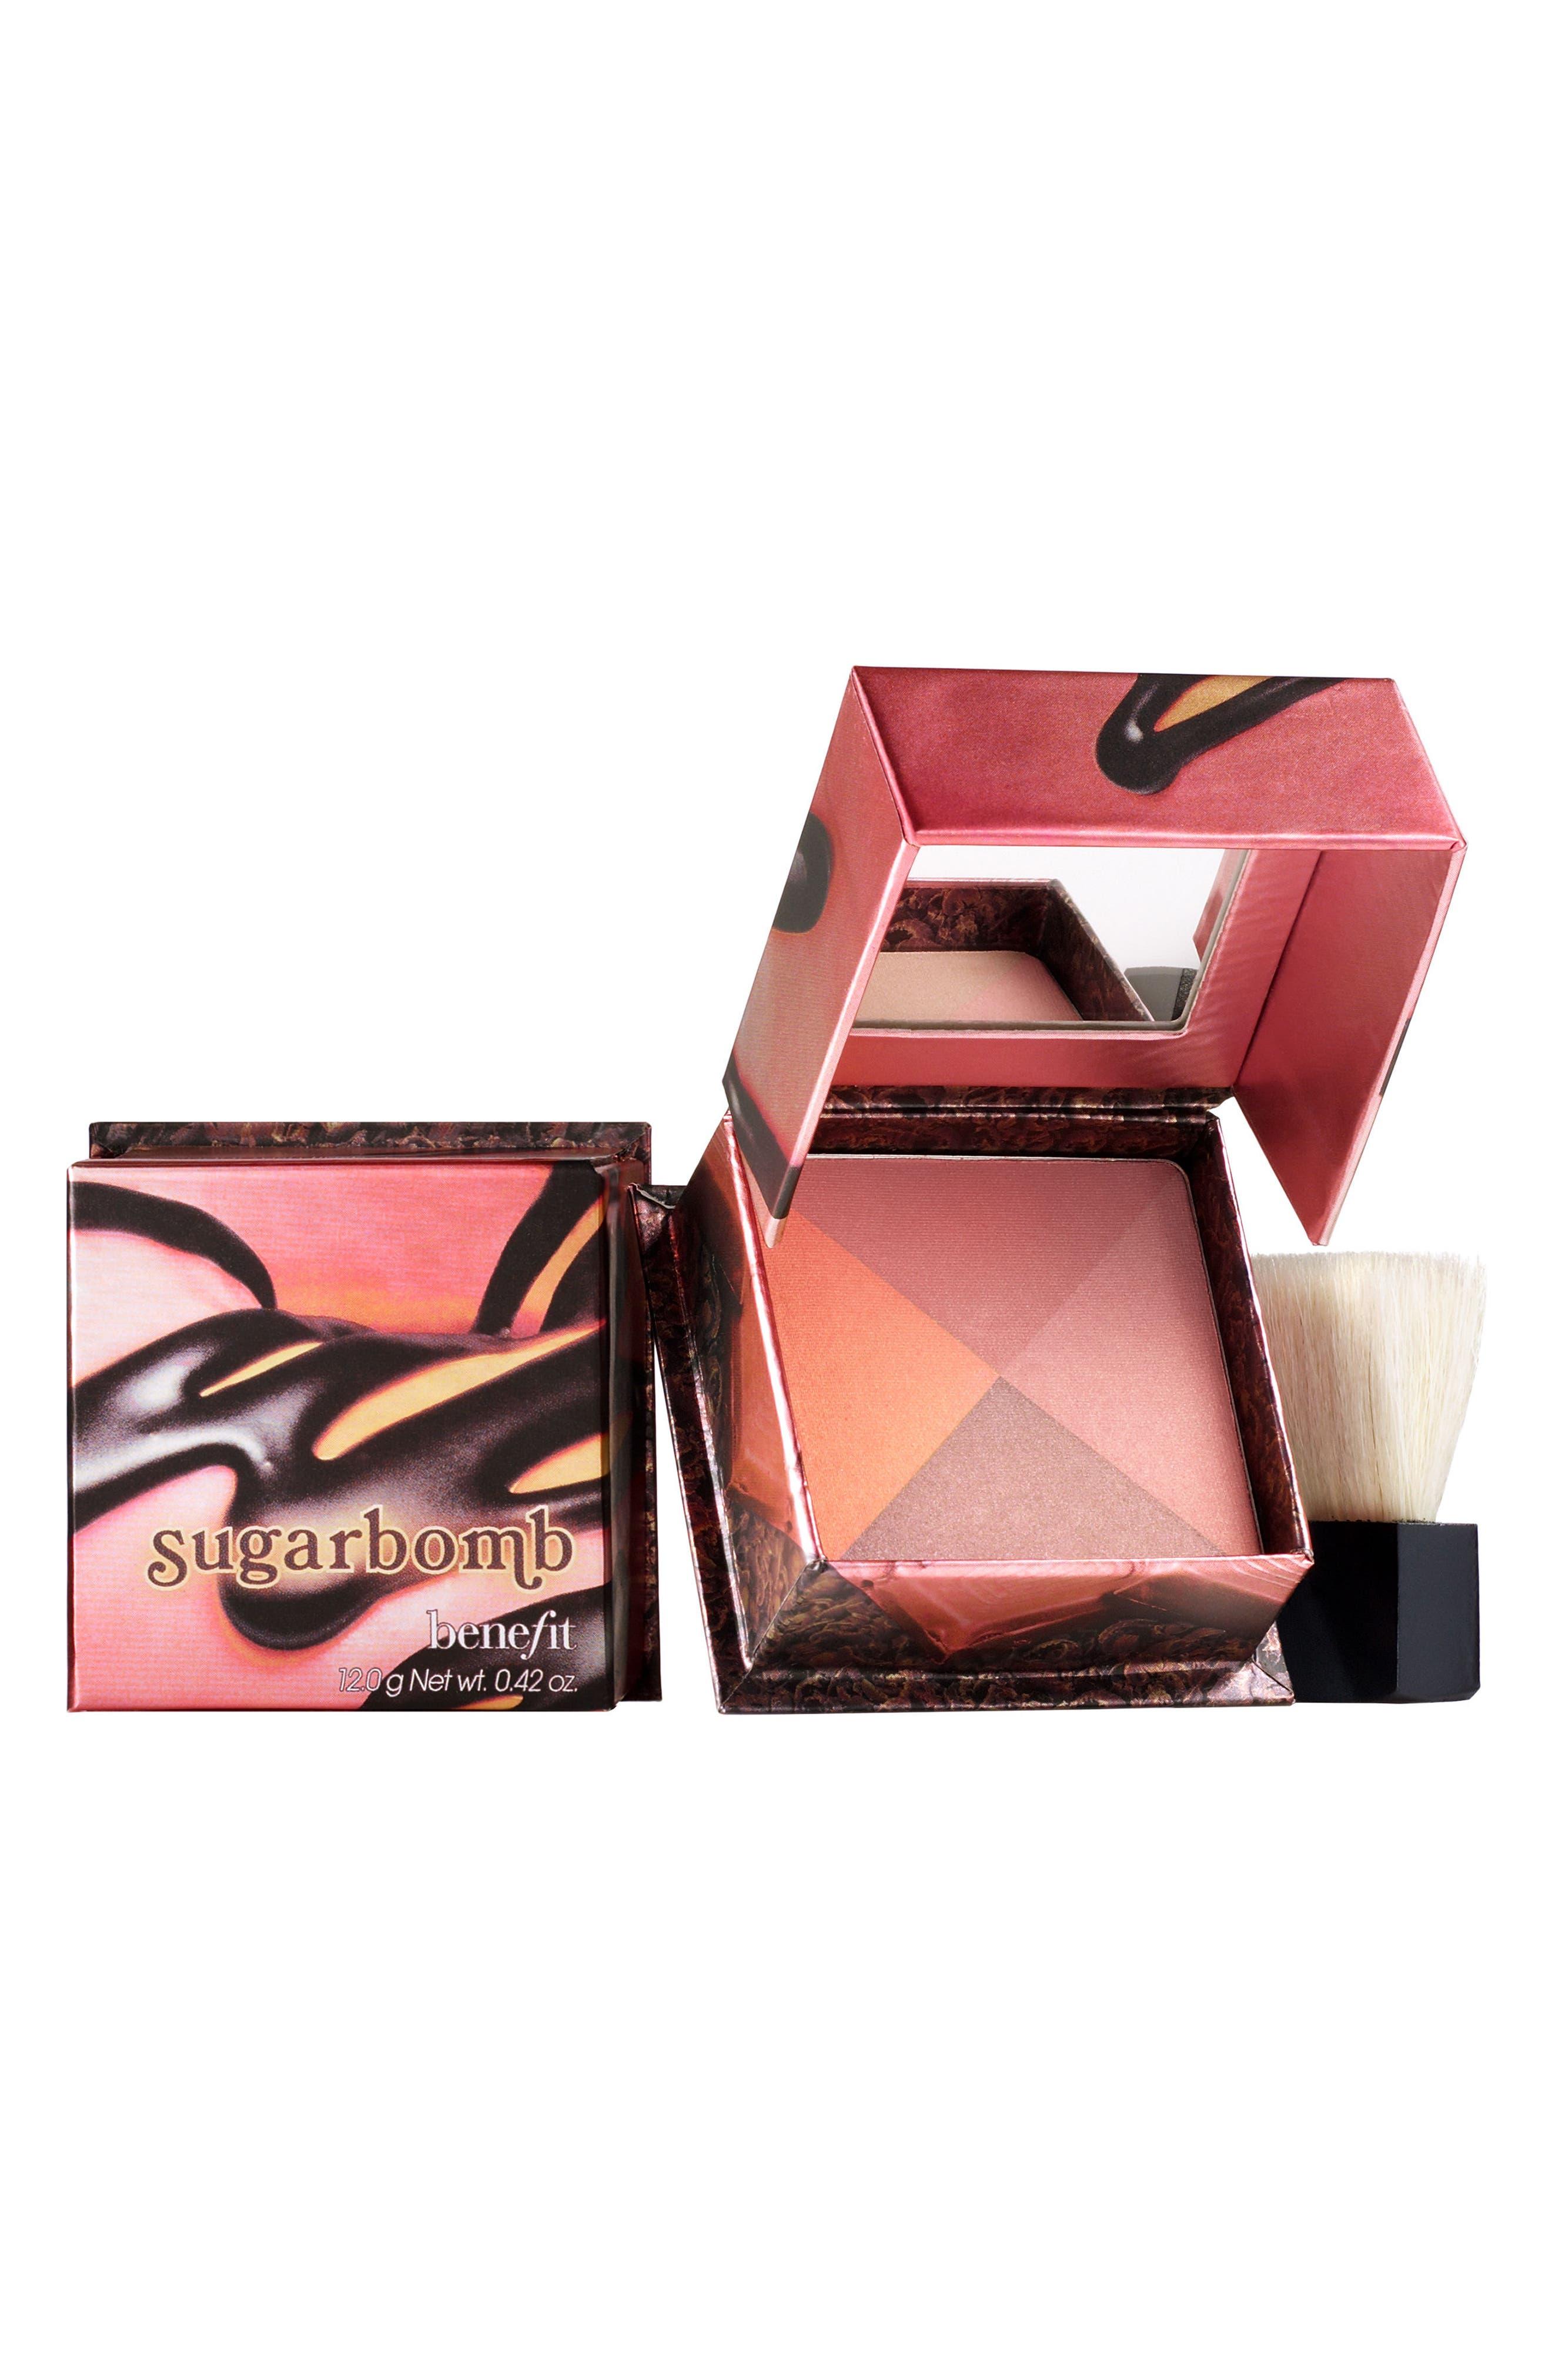 Benefit Sugarbomb Shimmer Powder Blush,                         Main,                         color, SUGAR RUSH FLUSH